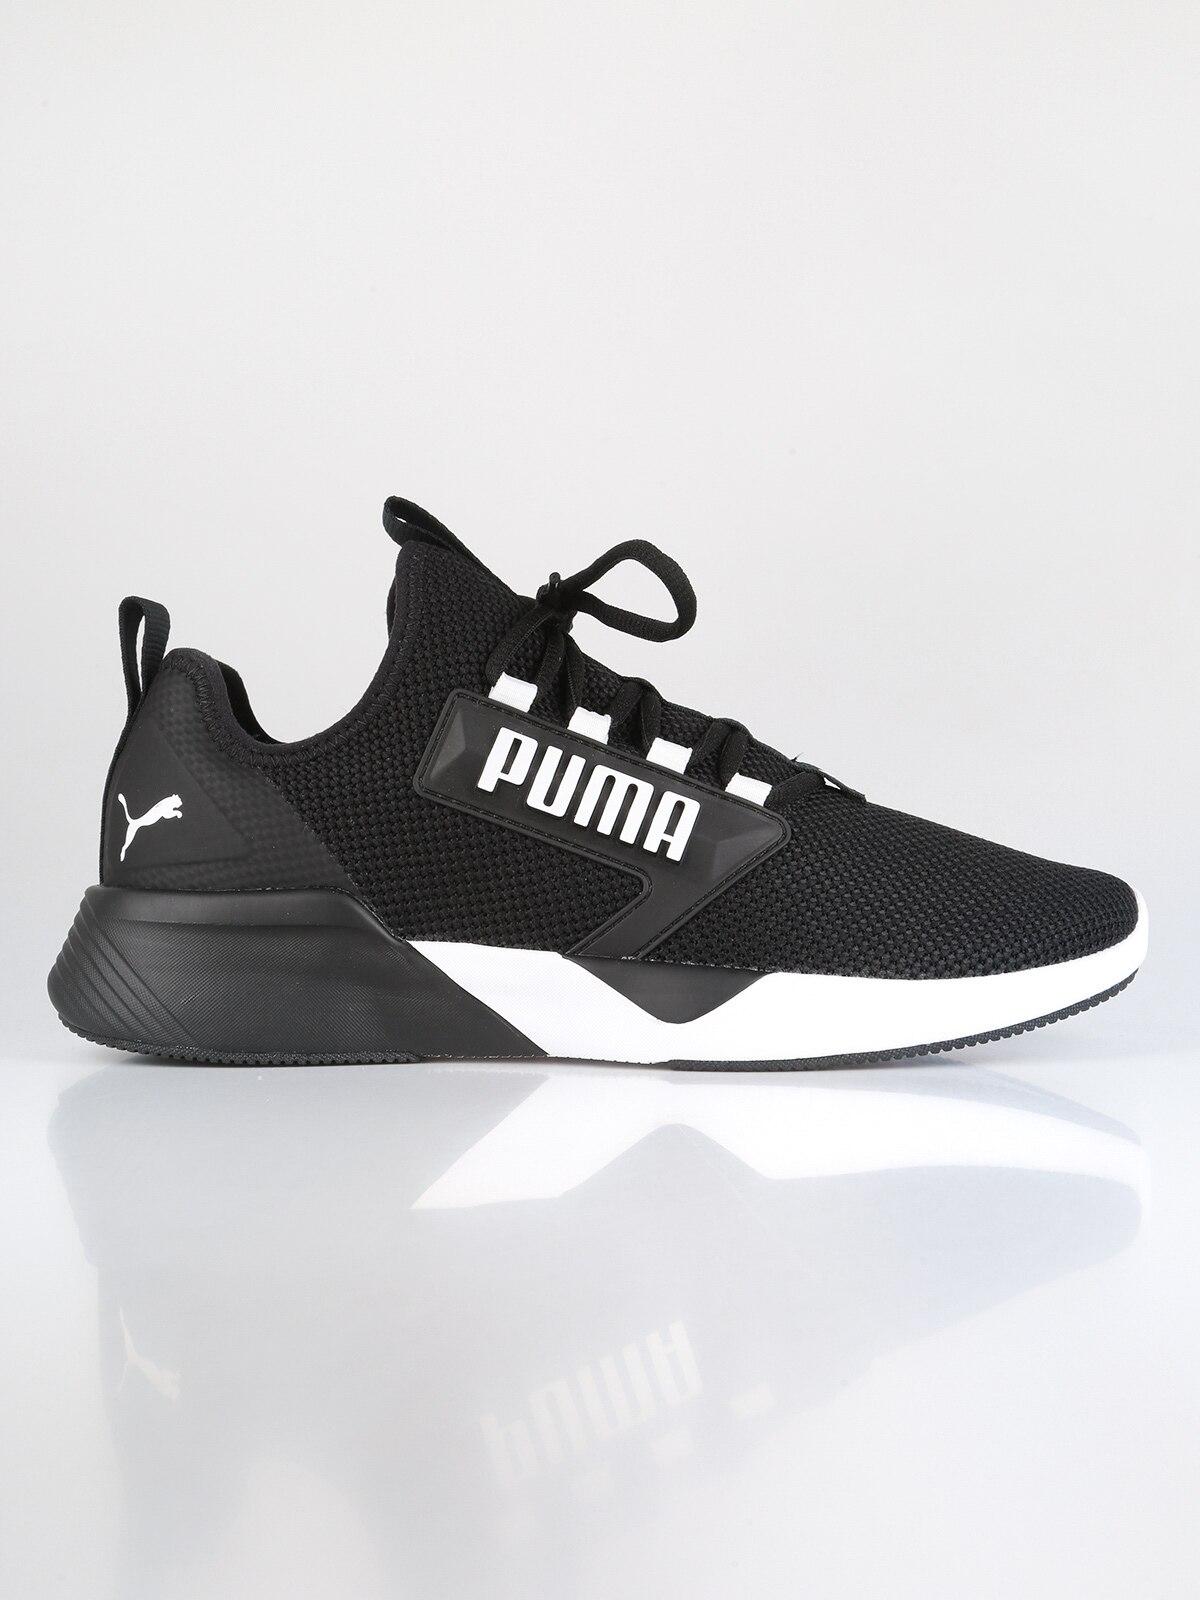 PUMA Retaliate black sneakers|Fitness